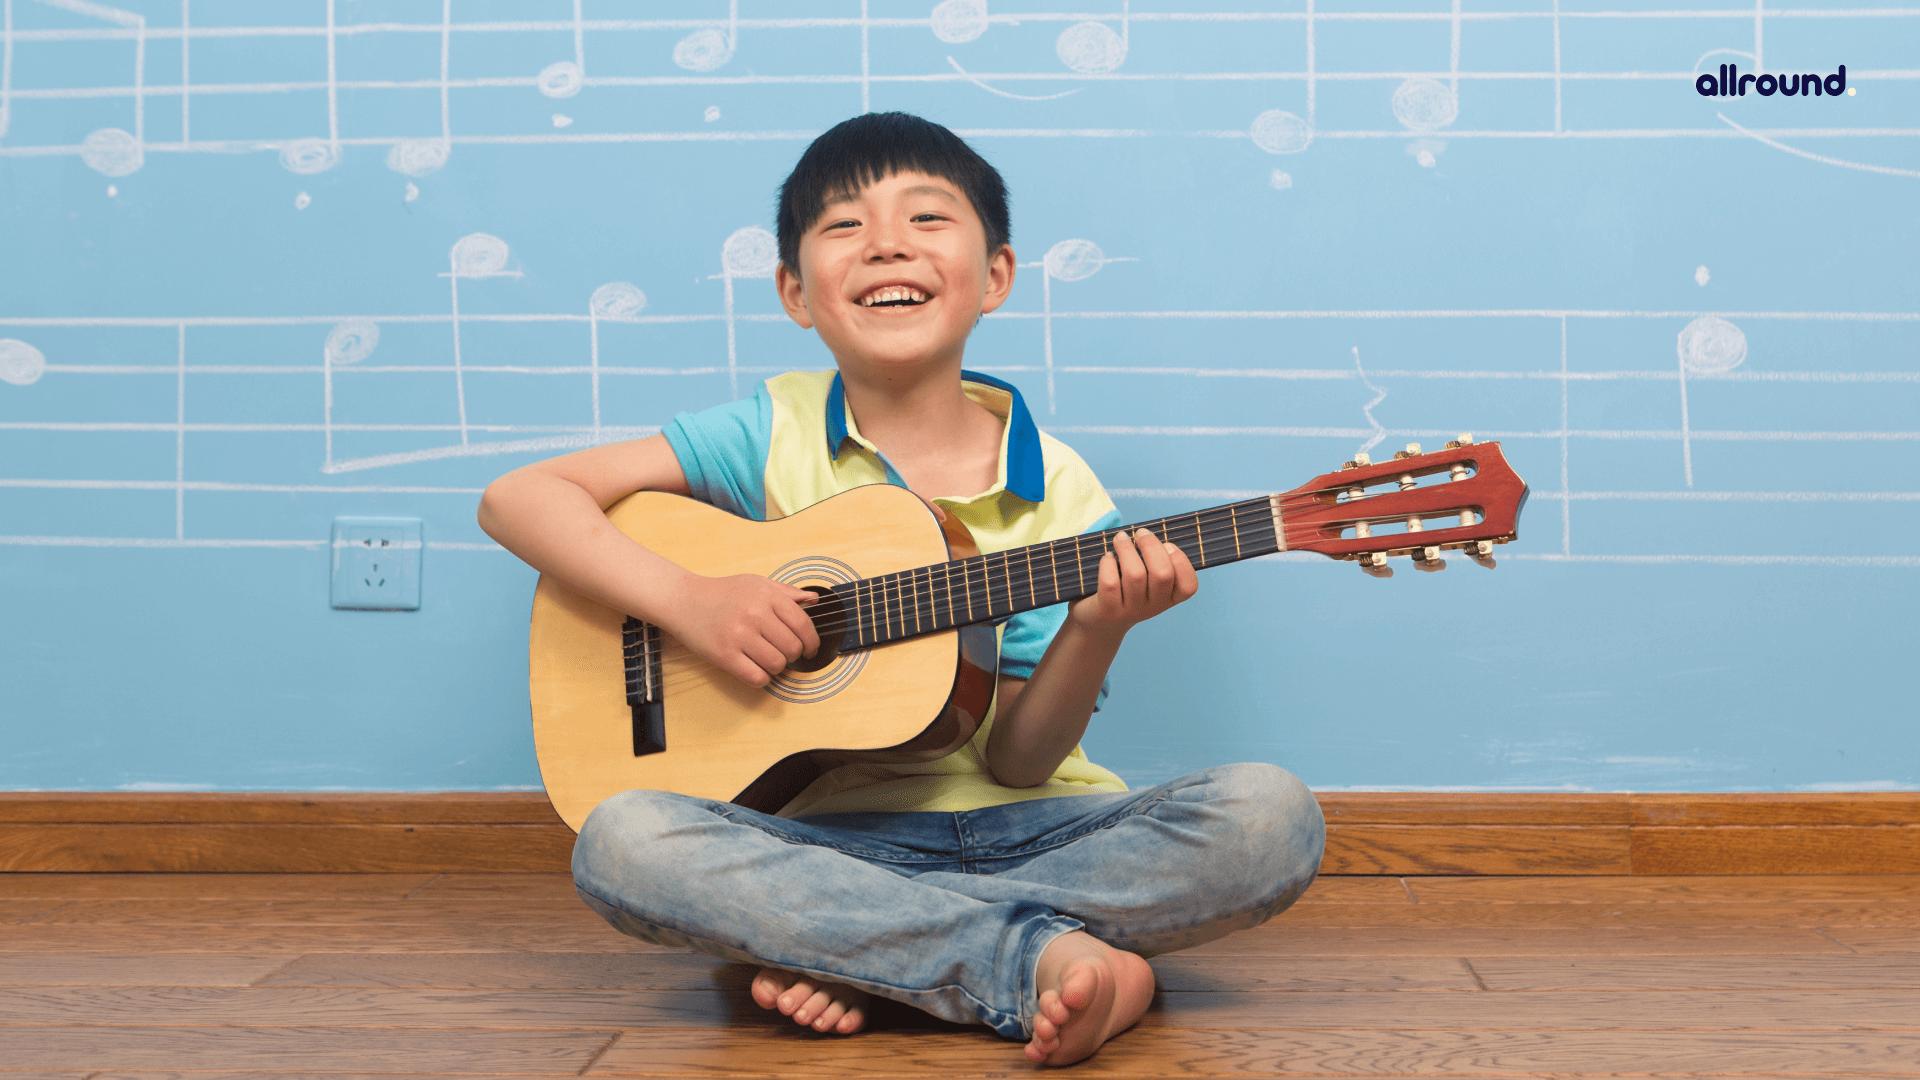 Easy guitar chords for beginners